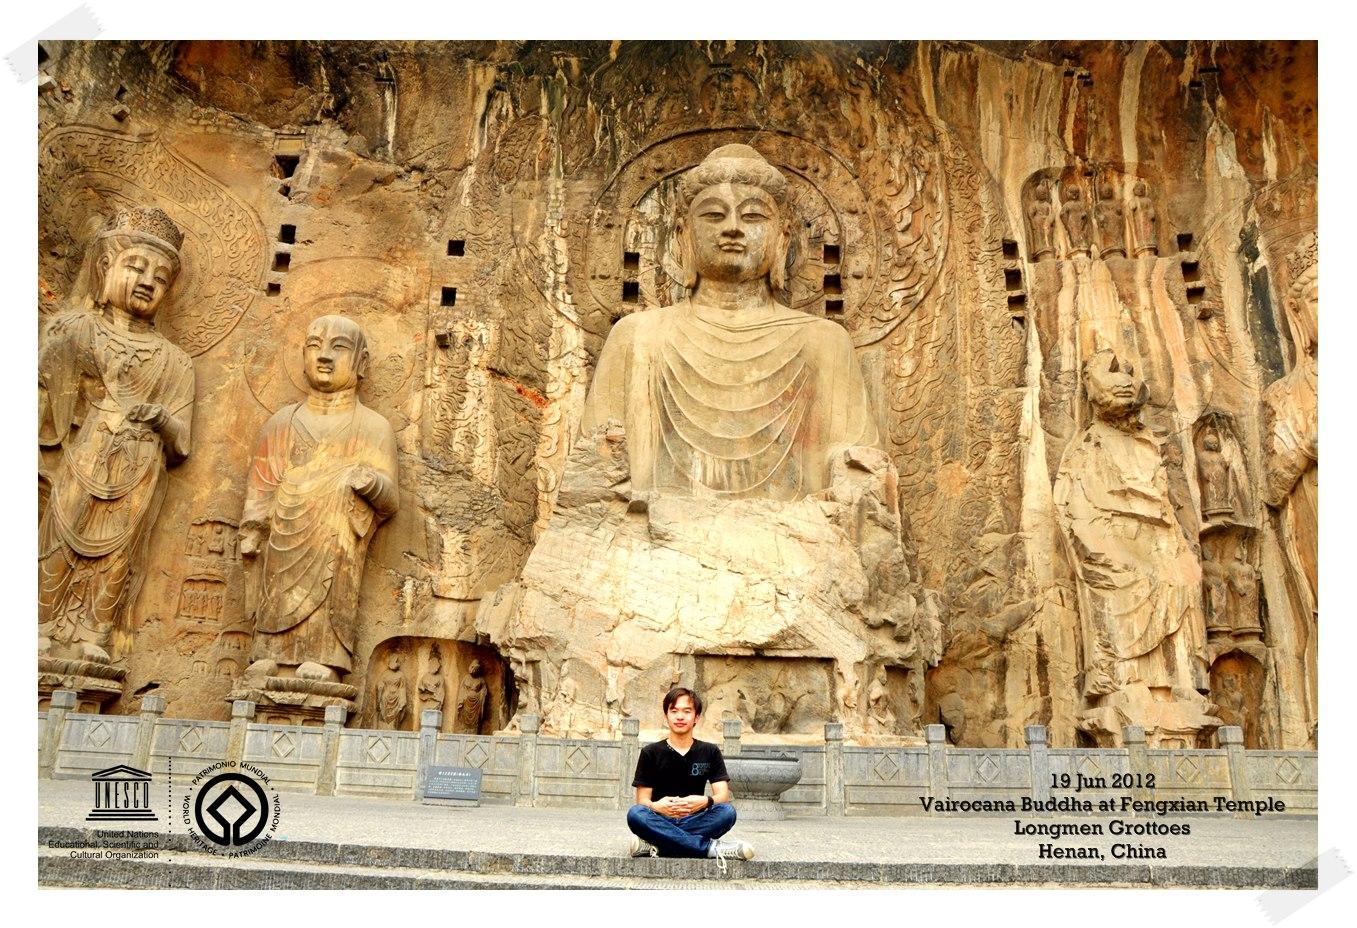 The Giant Buddha Longmen Grottoes - China Thomas shaw